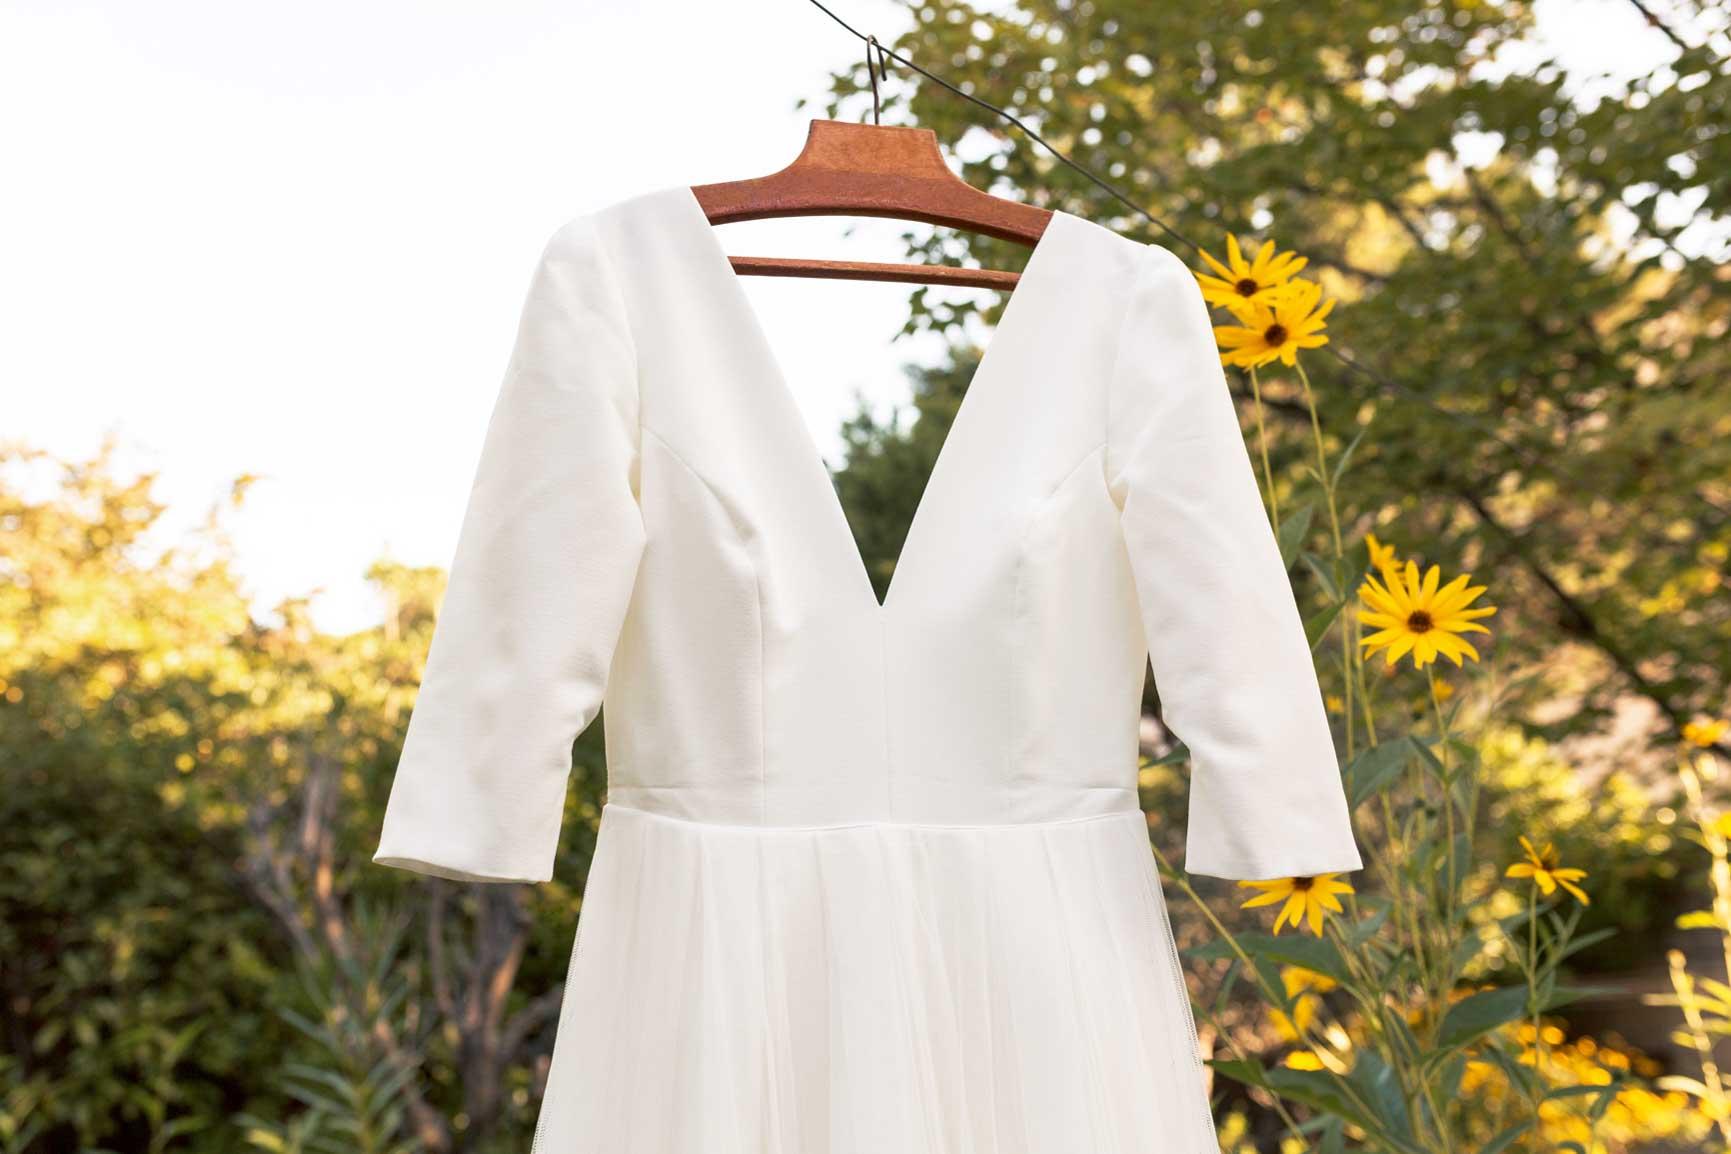 Robe de mariée Mariage intimiste Vaucluse | Aurore & Victor